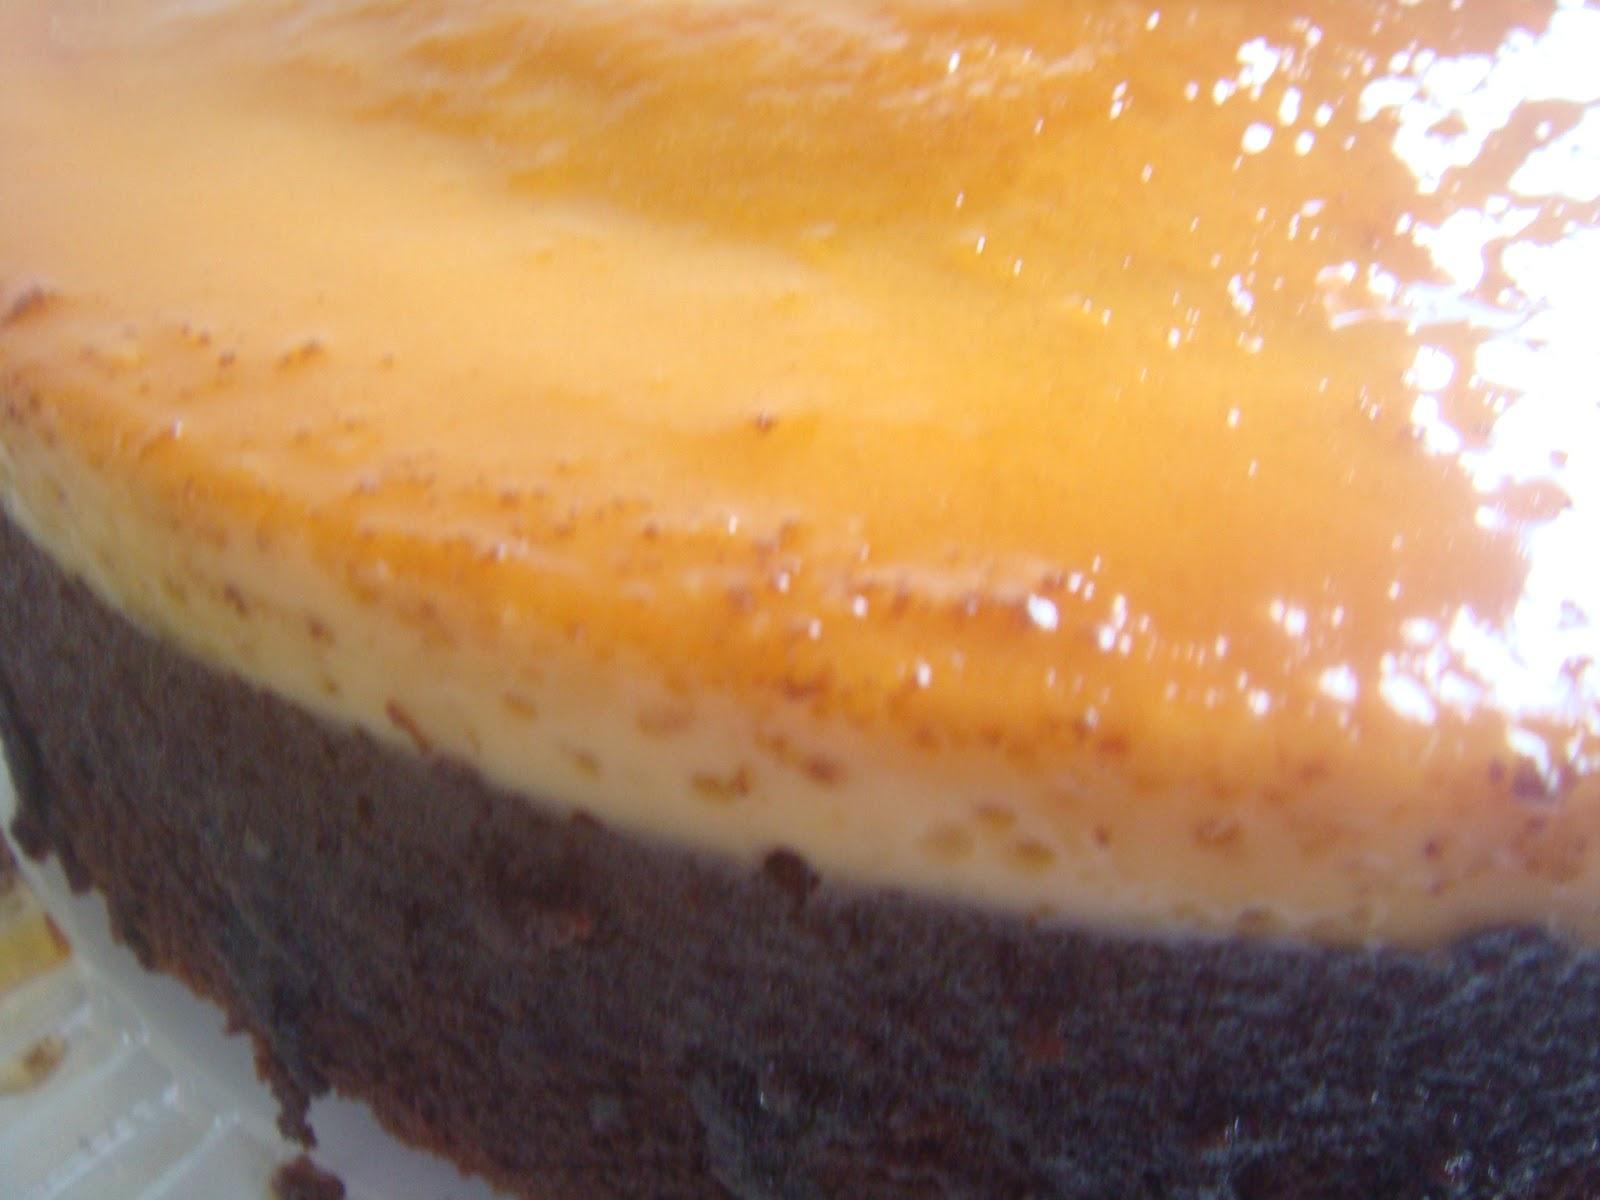 resepi kek coklat moist  ganache soalan Resepi Kek Pisang Tanpa Telur Sukatan Cawan Enak dan Mudah